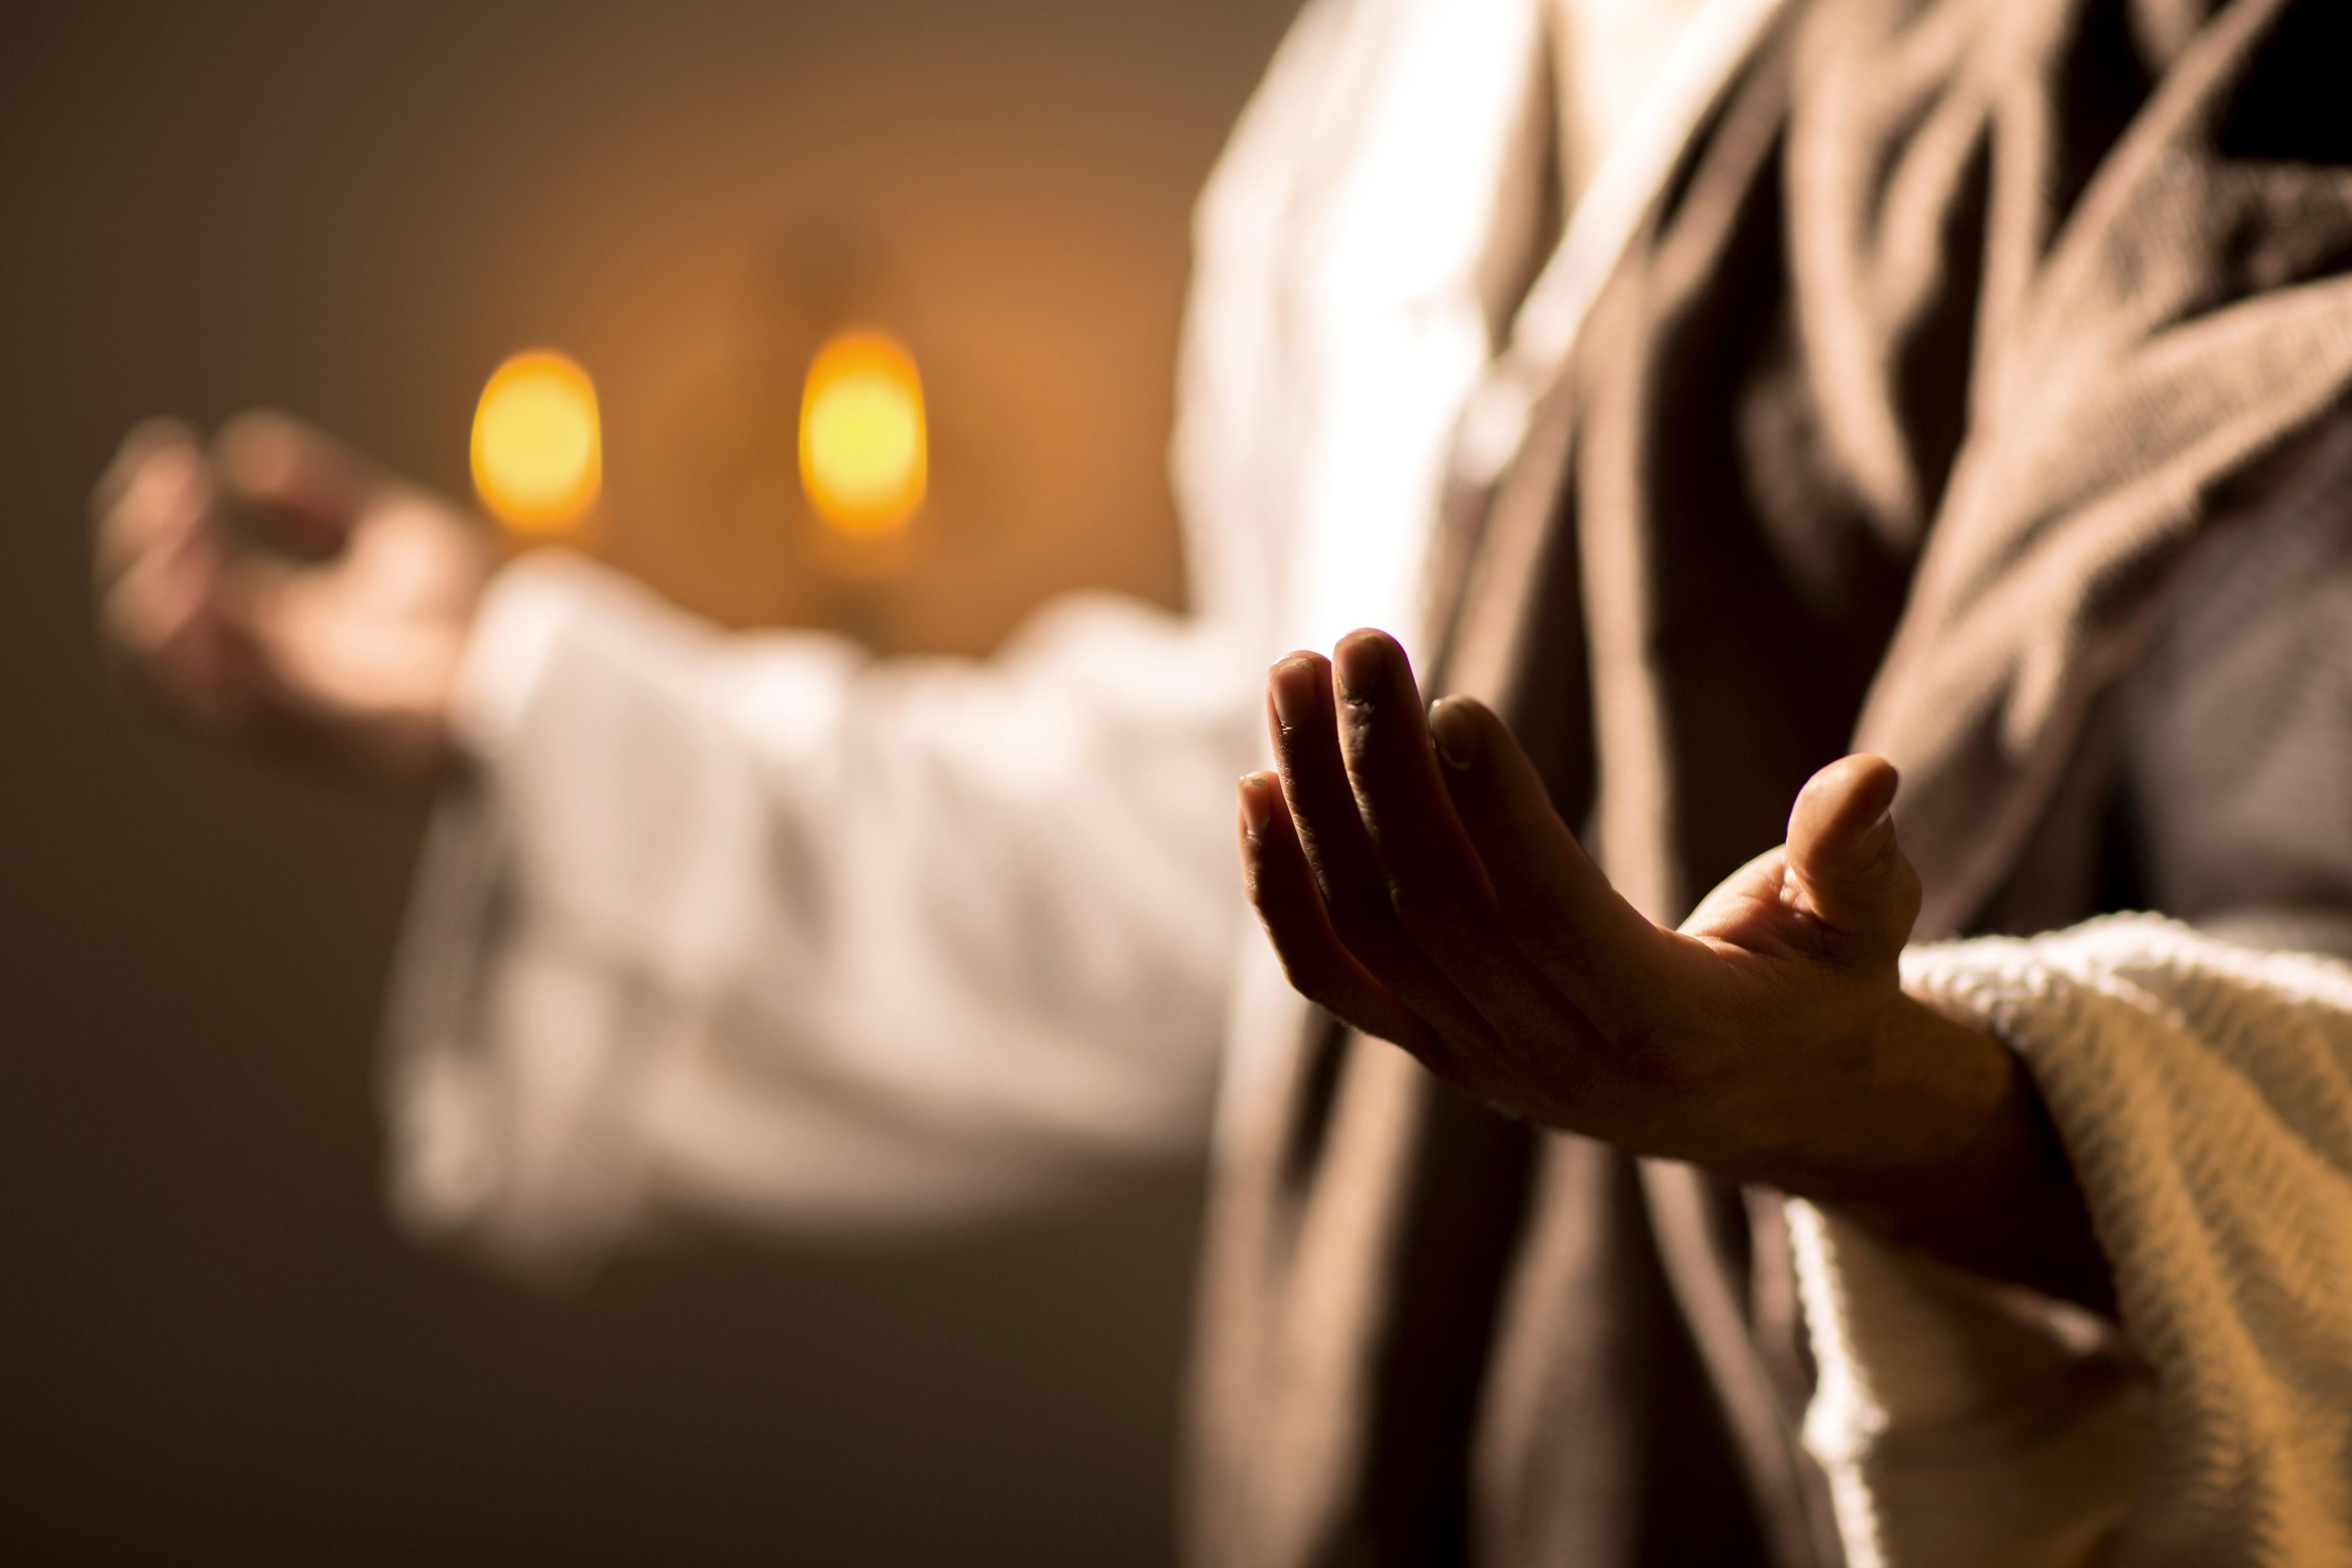 Christ at prayer